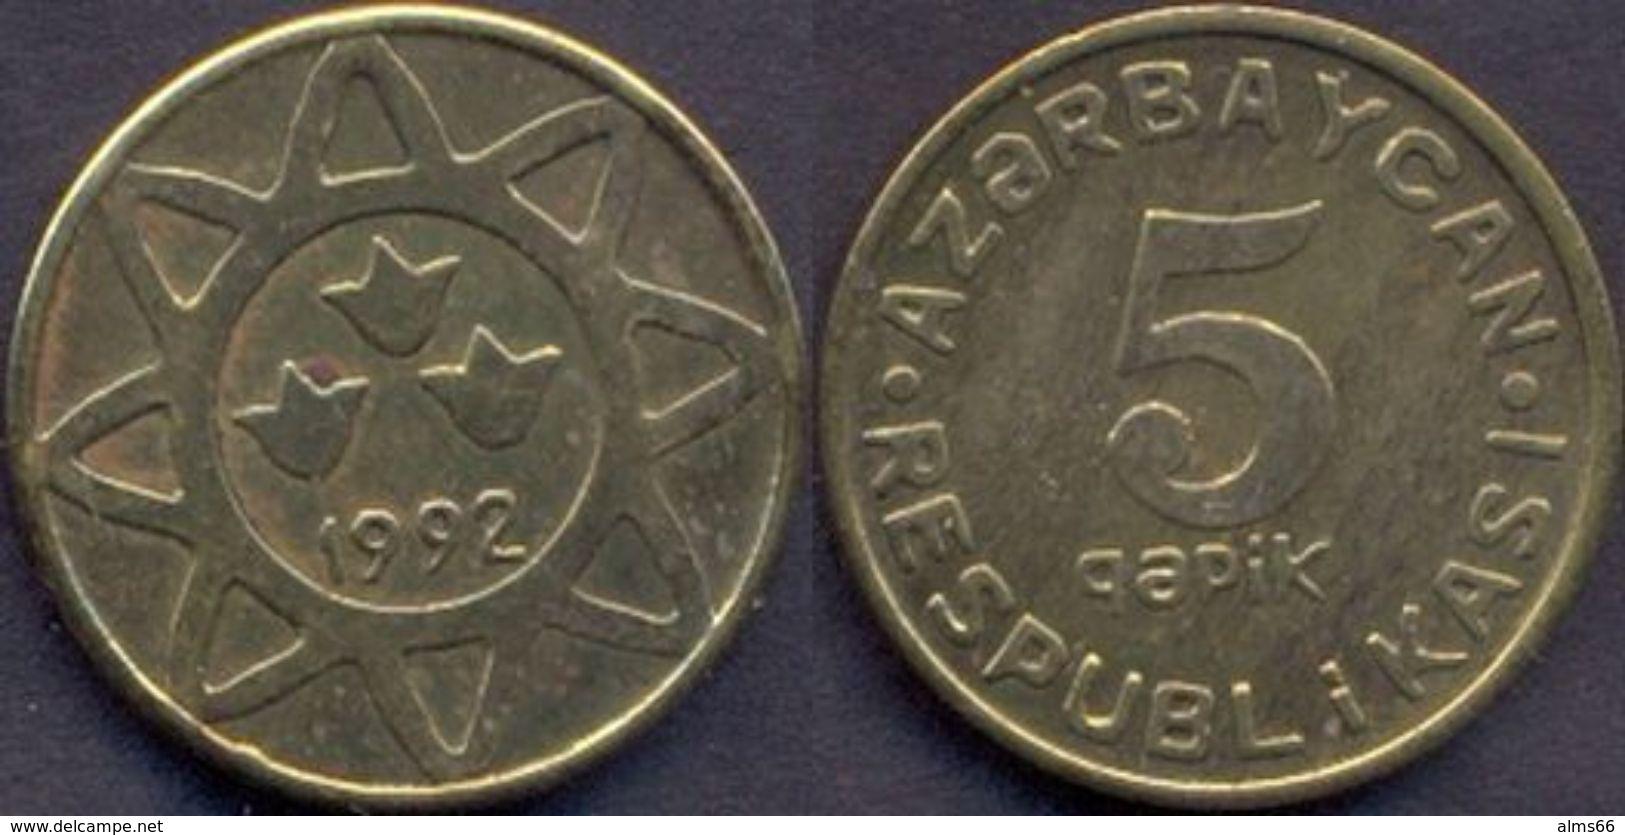 Azerbaijan 5 Qapik 1992 UNC Brass RARE - Azerbaïdjan